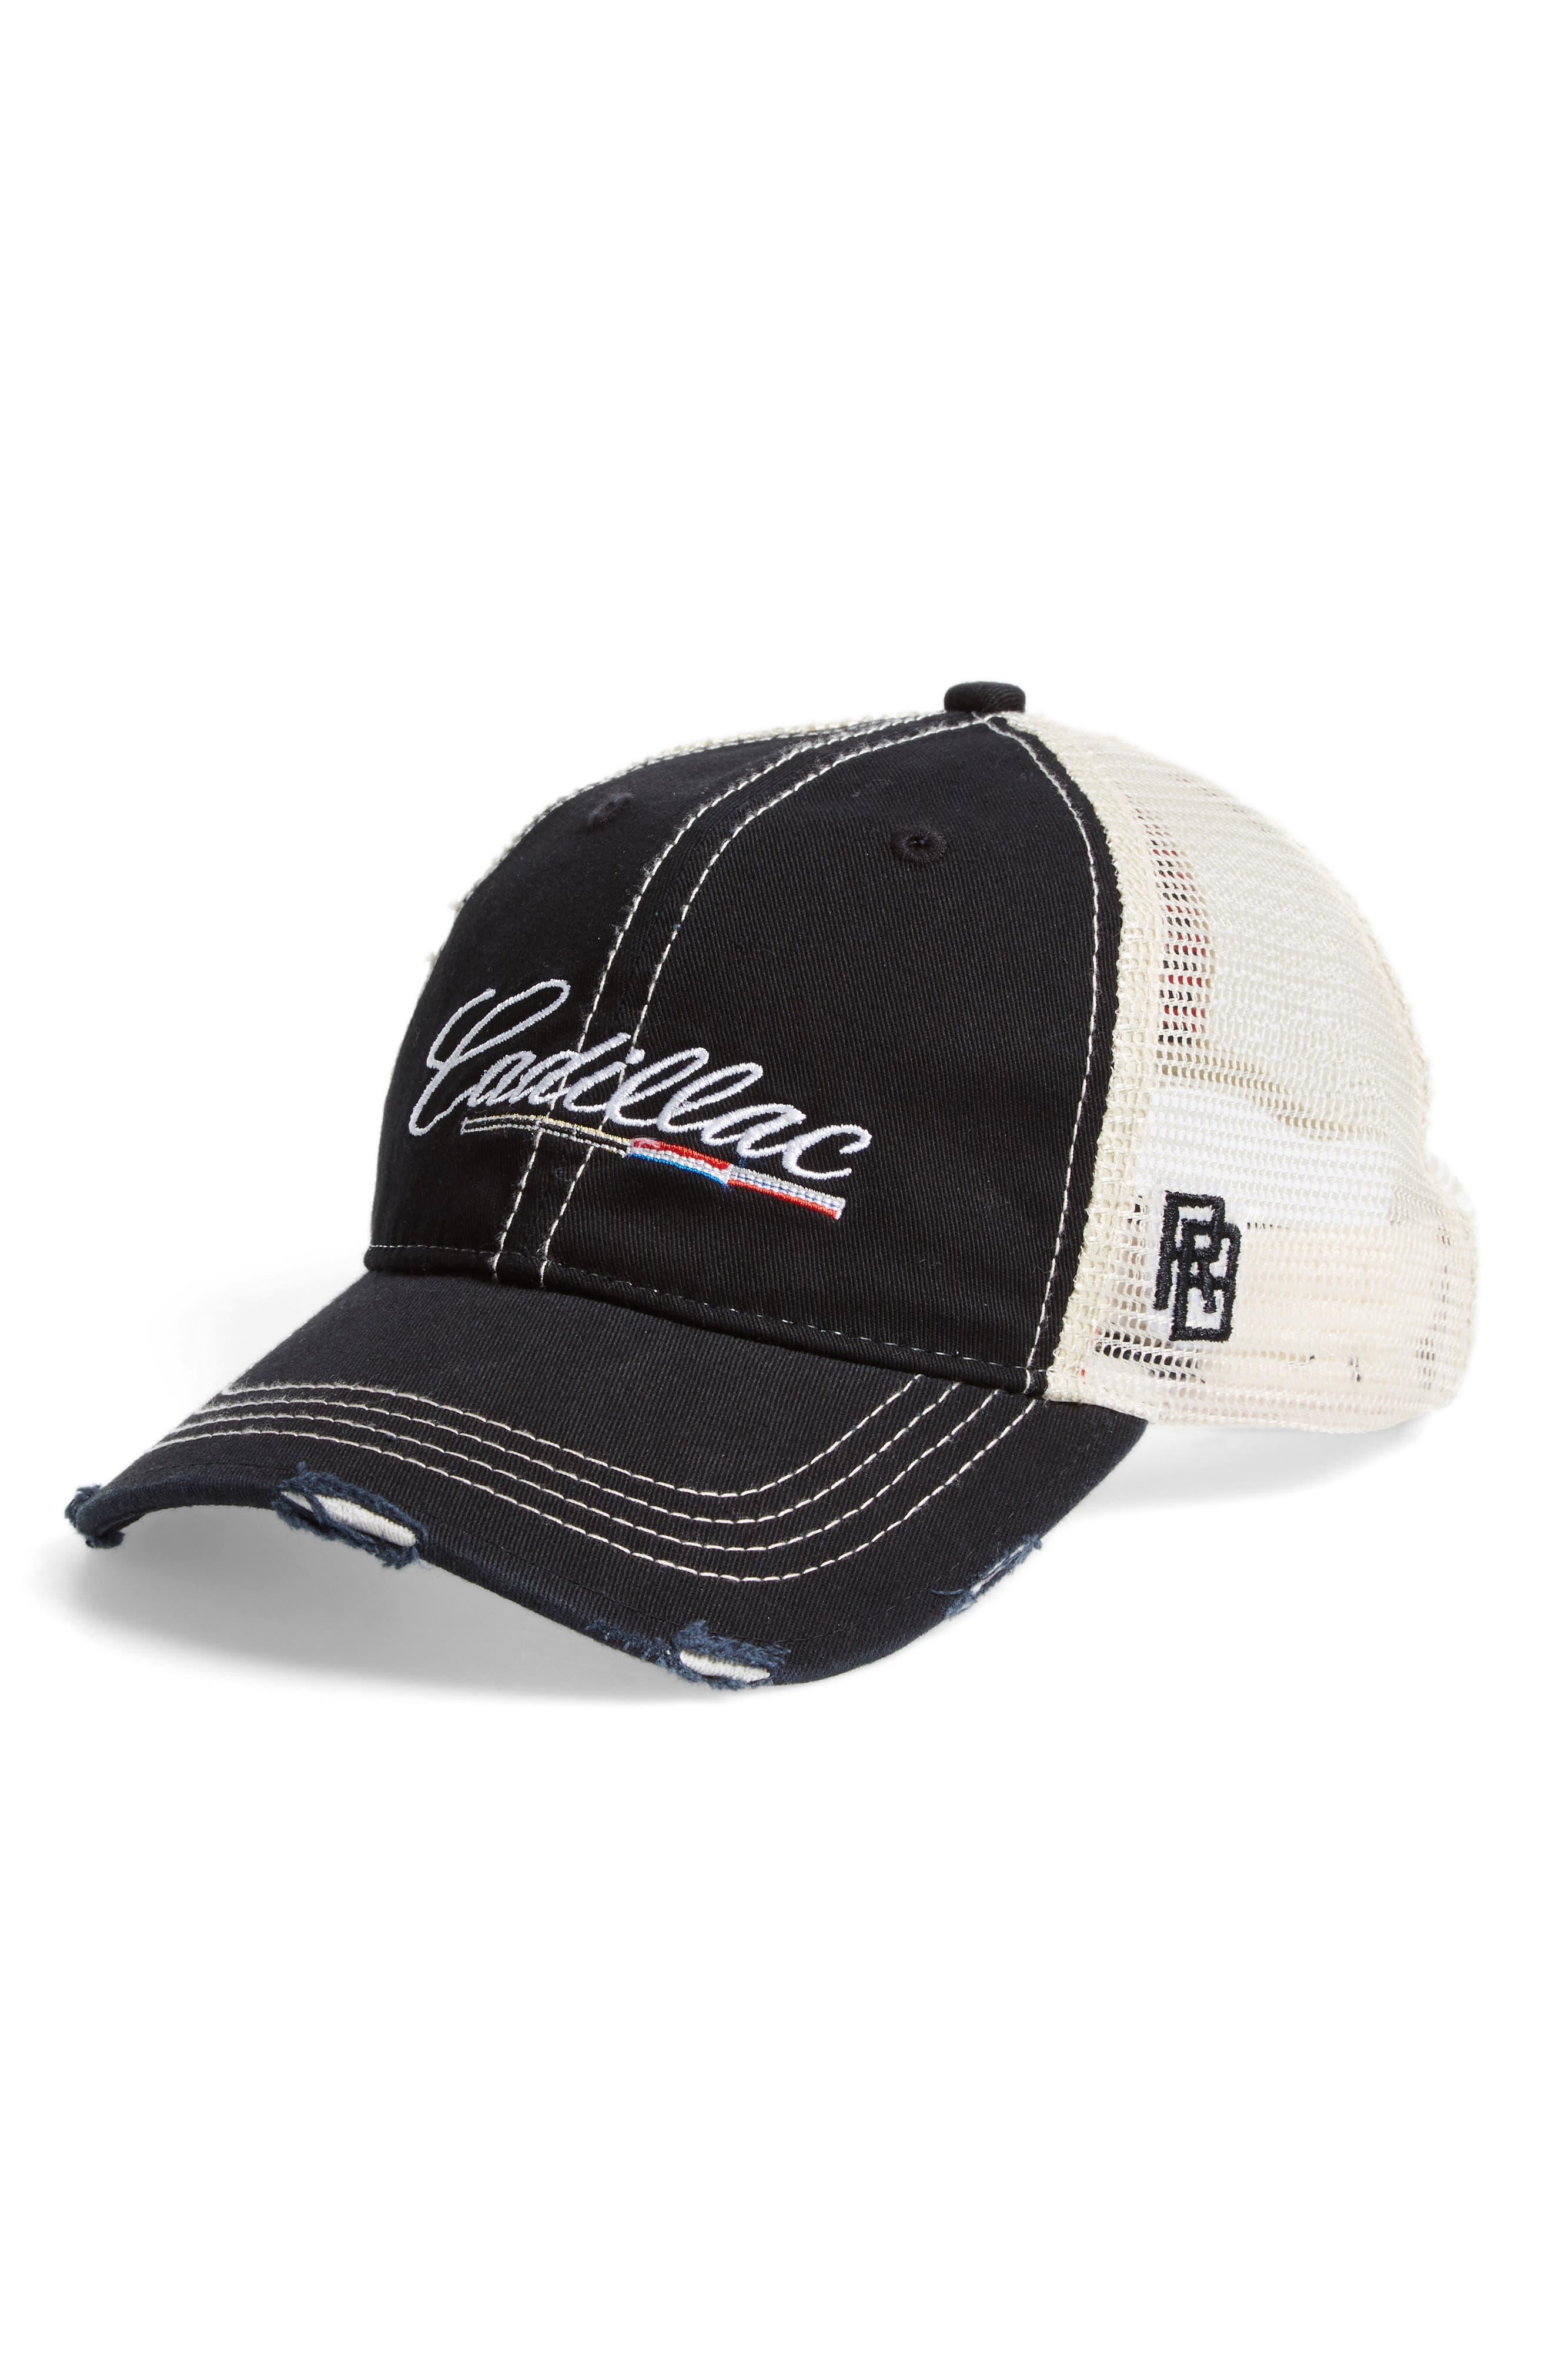 Original Retro Brand Cadillac Trucker Hat